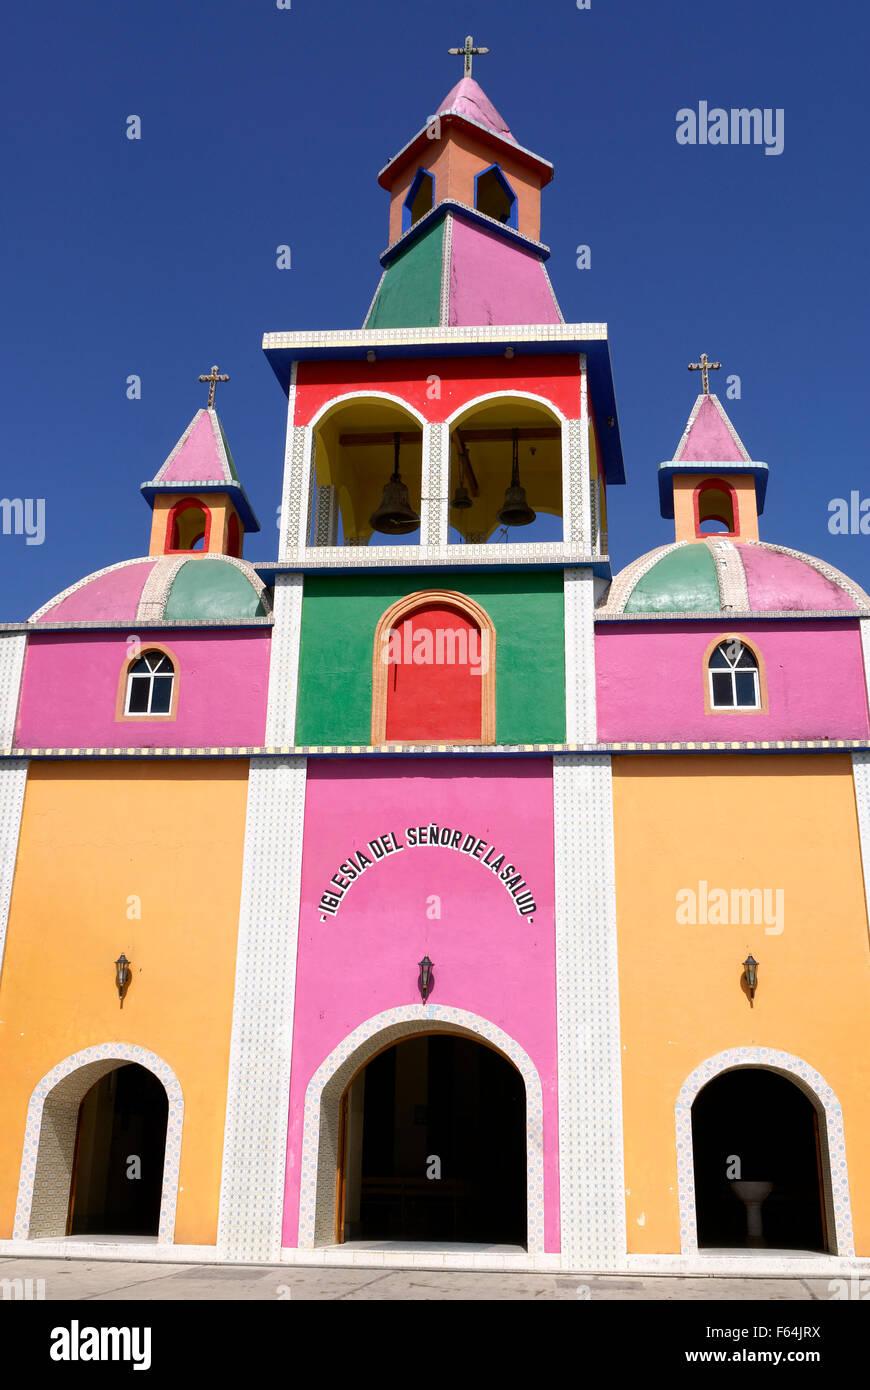 Brightly painted Mexican church at Herbolaria Beto Ramon, Aguacatitla, Axtla de Terrazas, San Luis Potosi state, - Stock Image